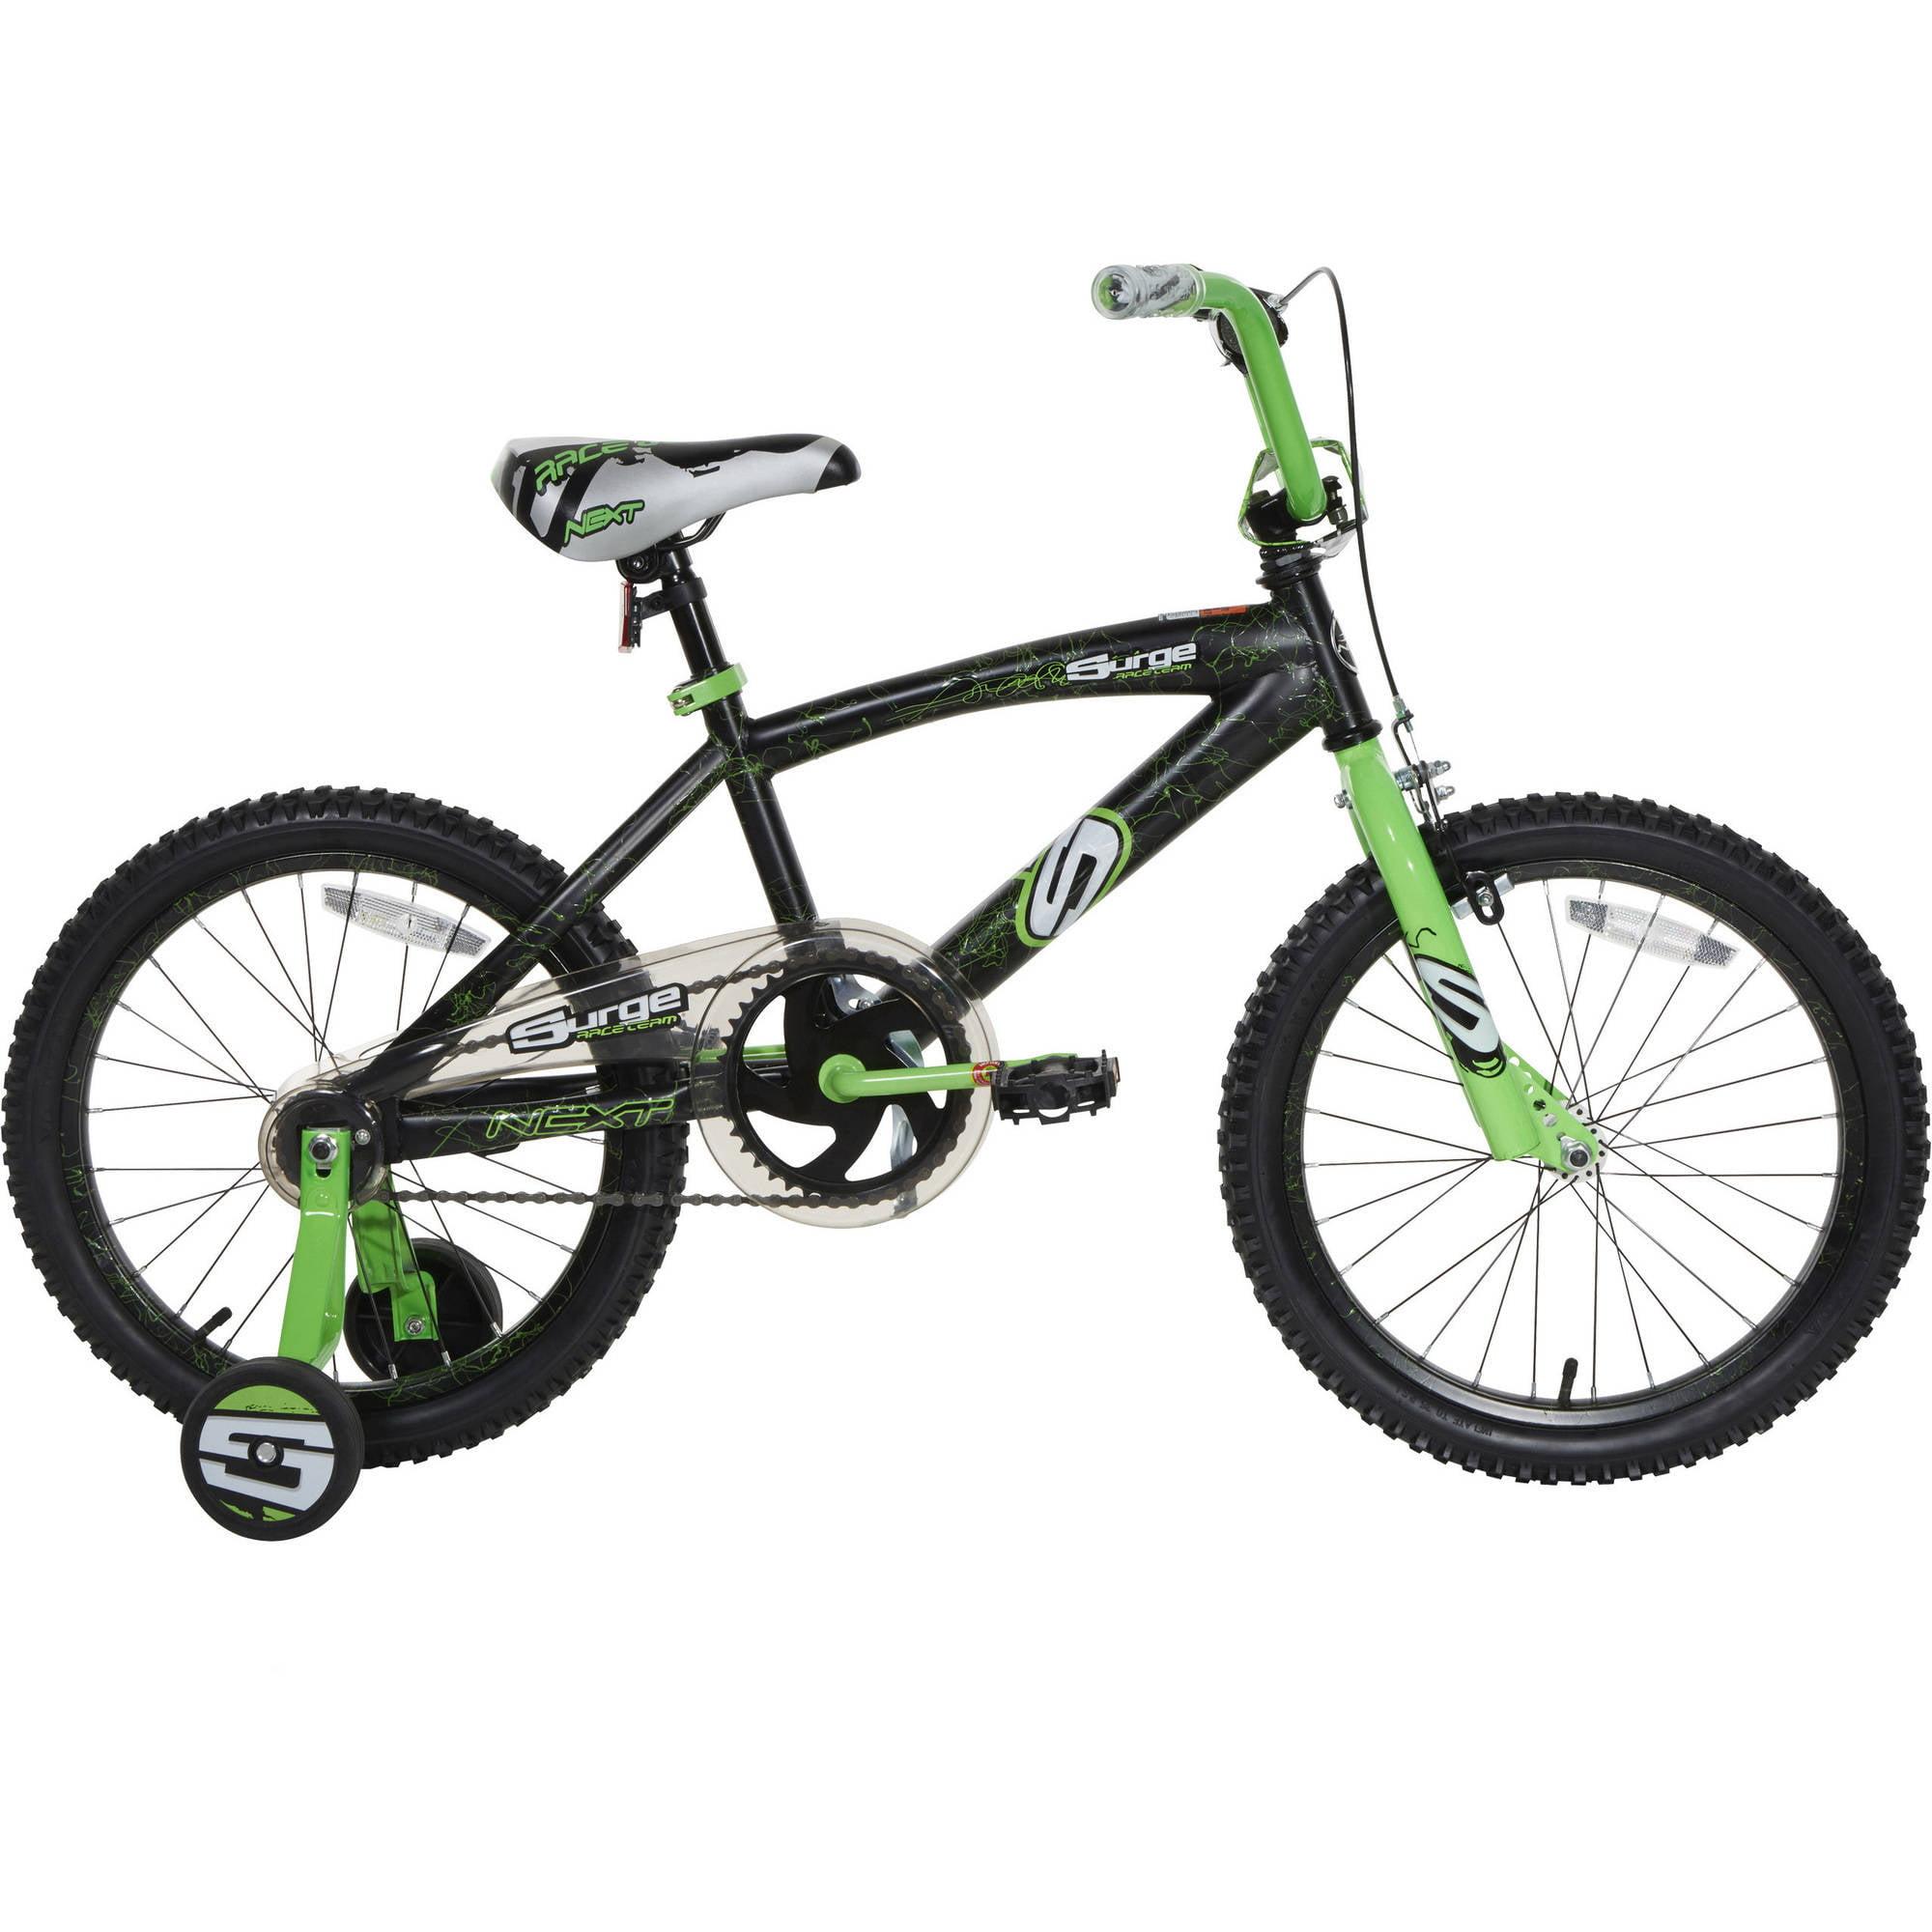 "18"" Next Surge Boys' BMX Bike, Black/Green"